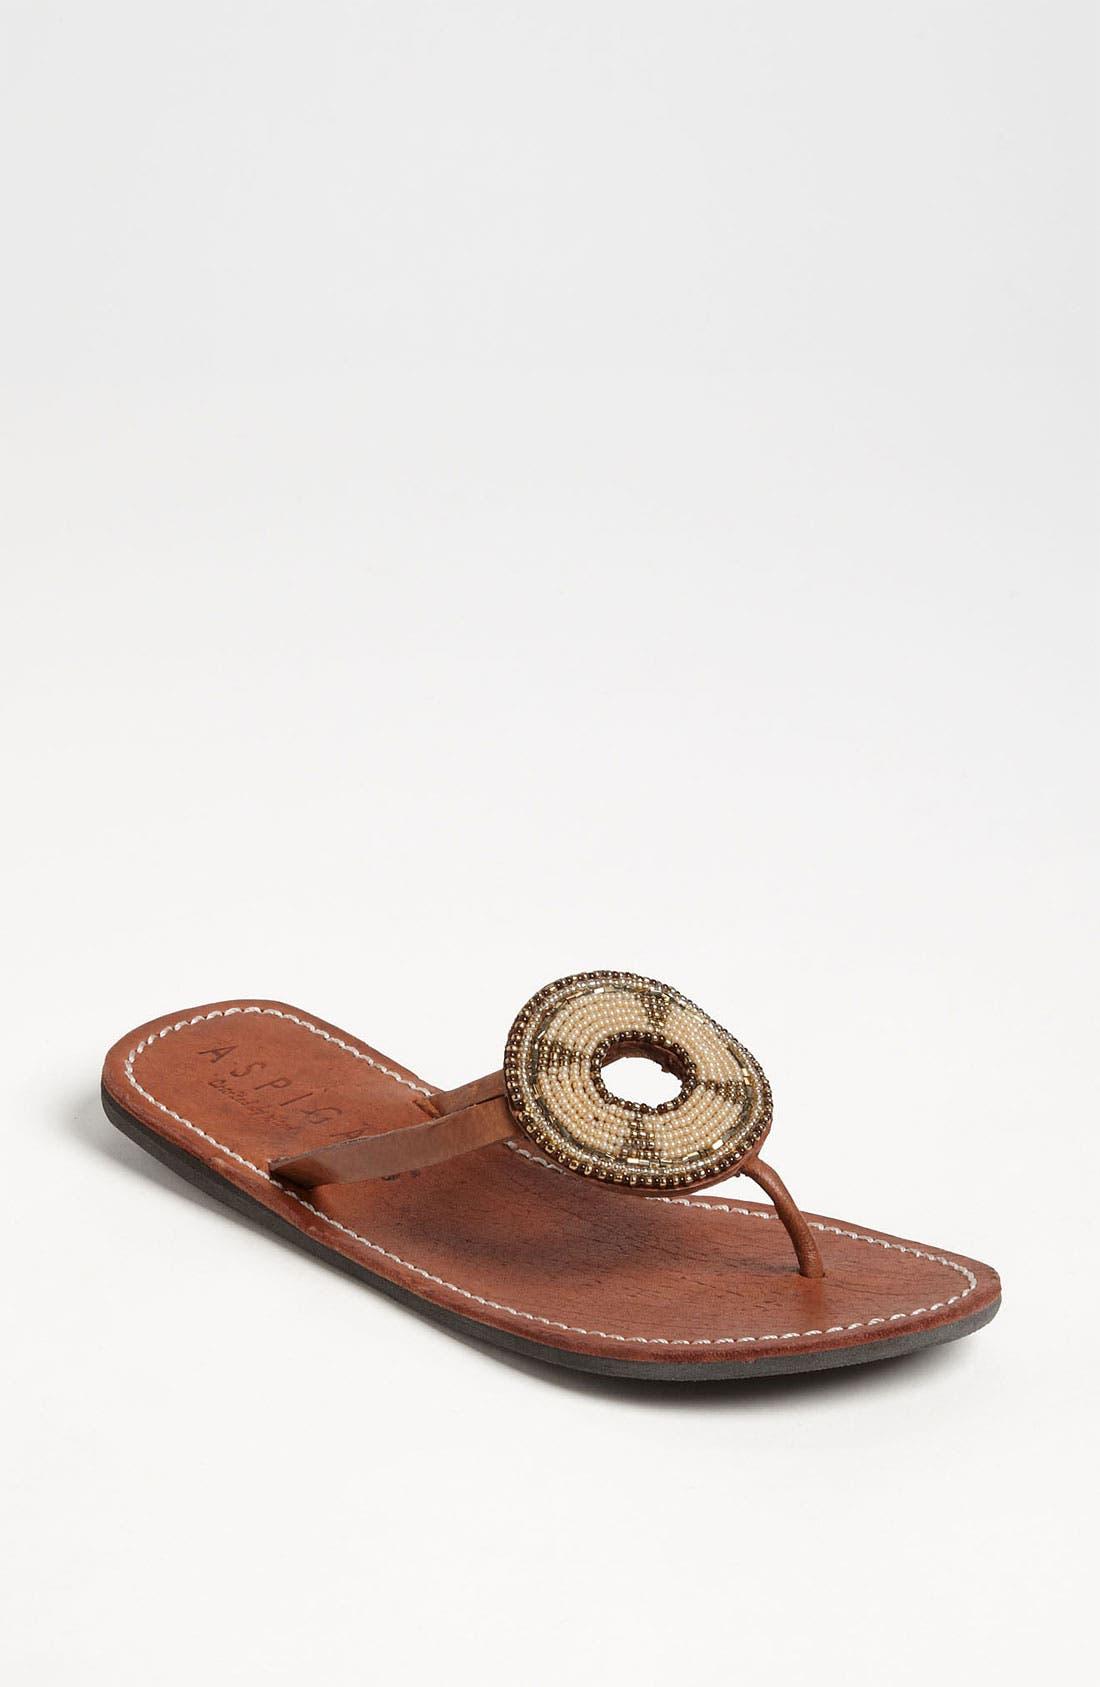 Main Image - Aspiga 'Masai Disc' Sandal